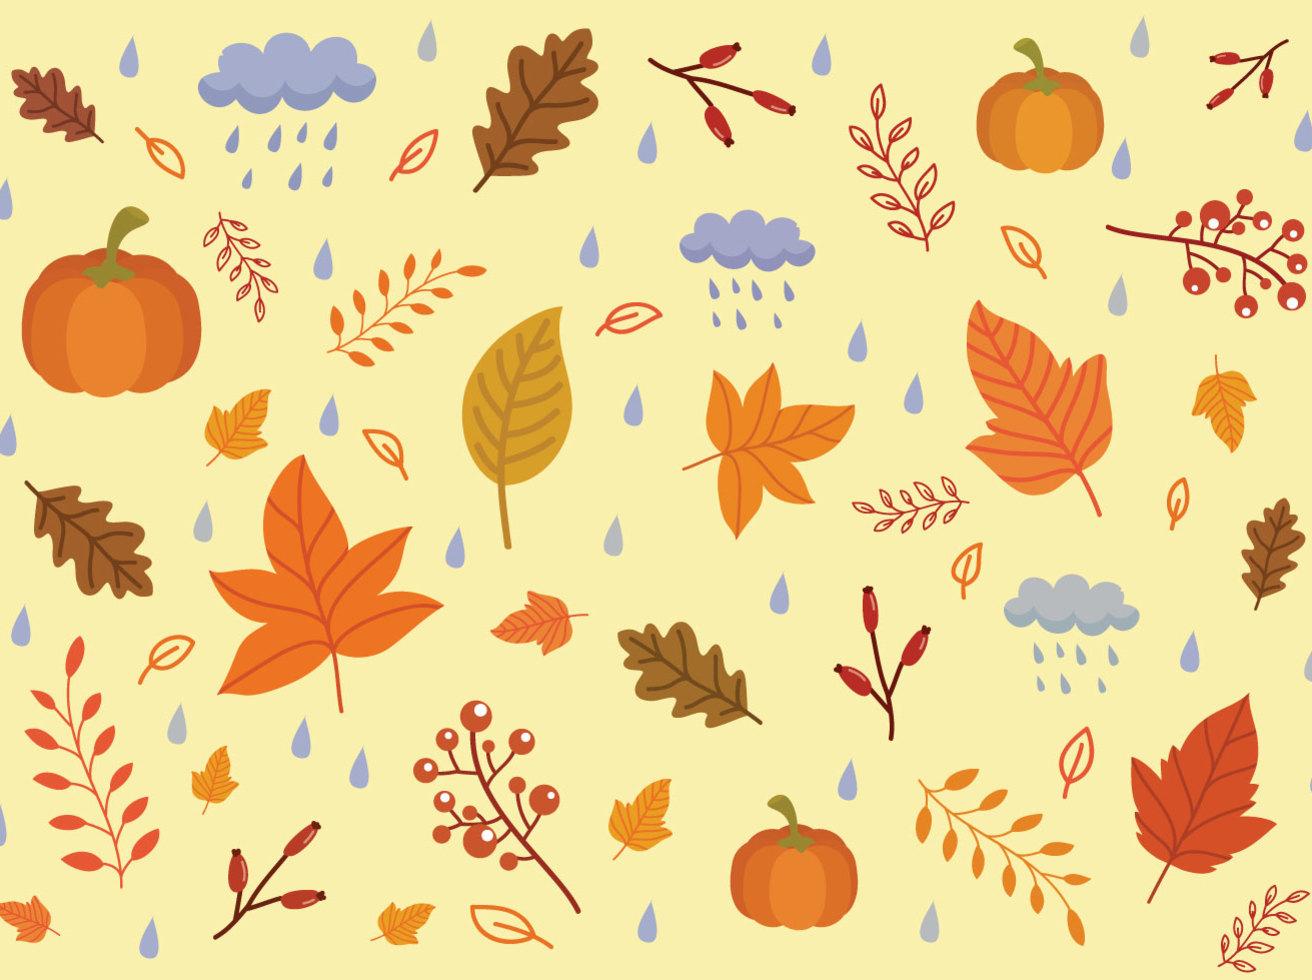 Fall Leaves Wallpaper Free Autumn Background Vectors Vector Art Amp Graphics